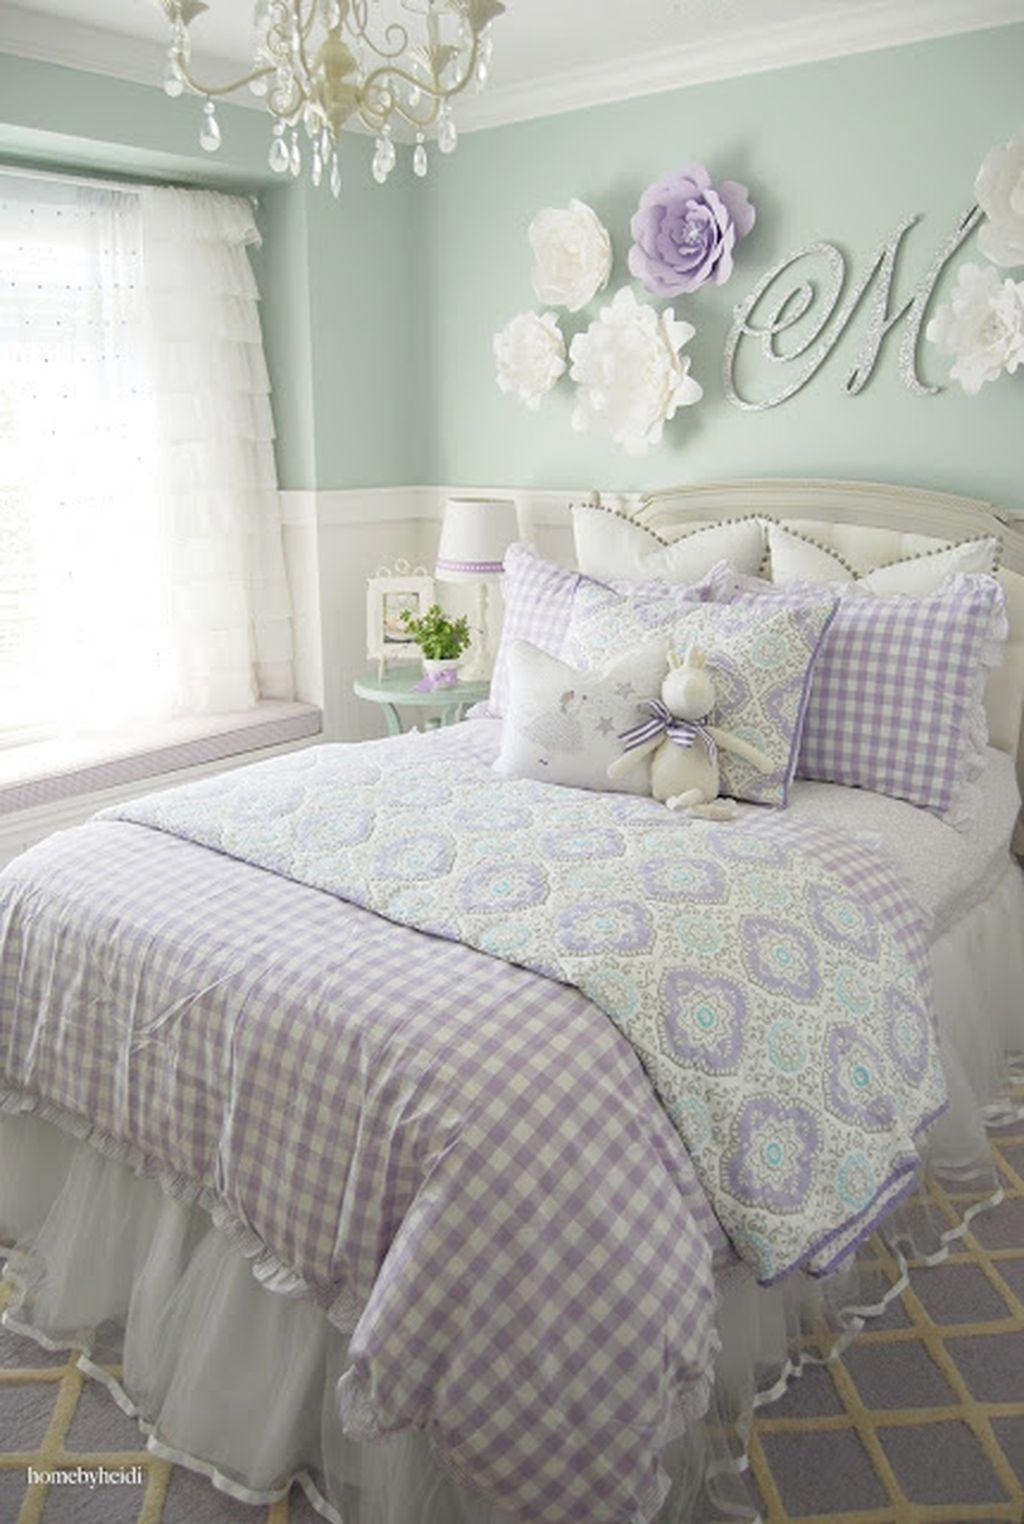 39 Wonderful Girls Room Design Ideas18